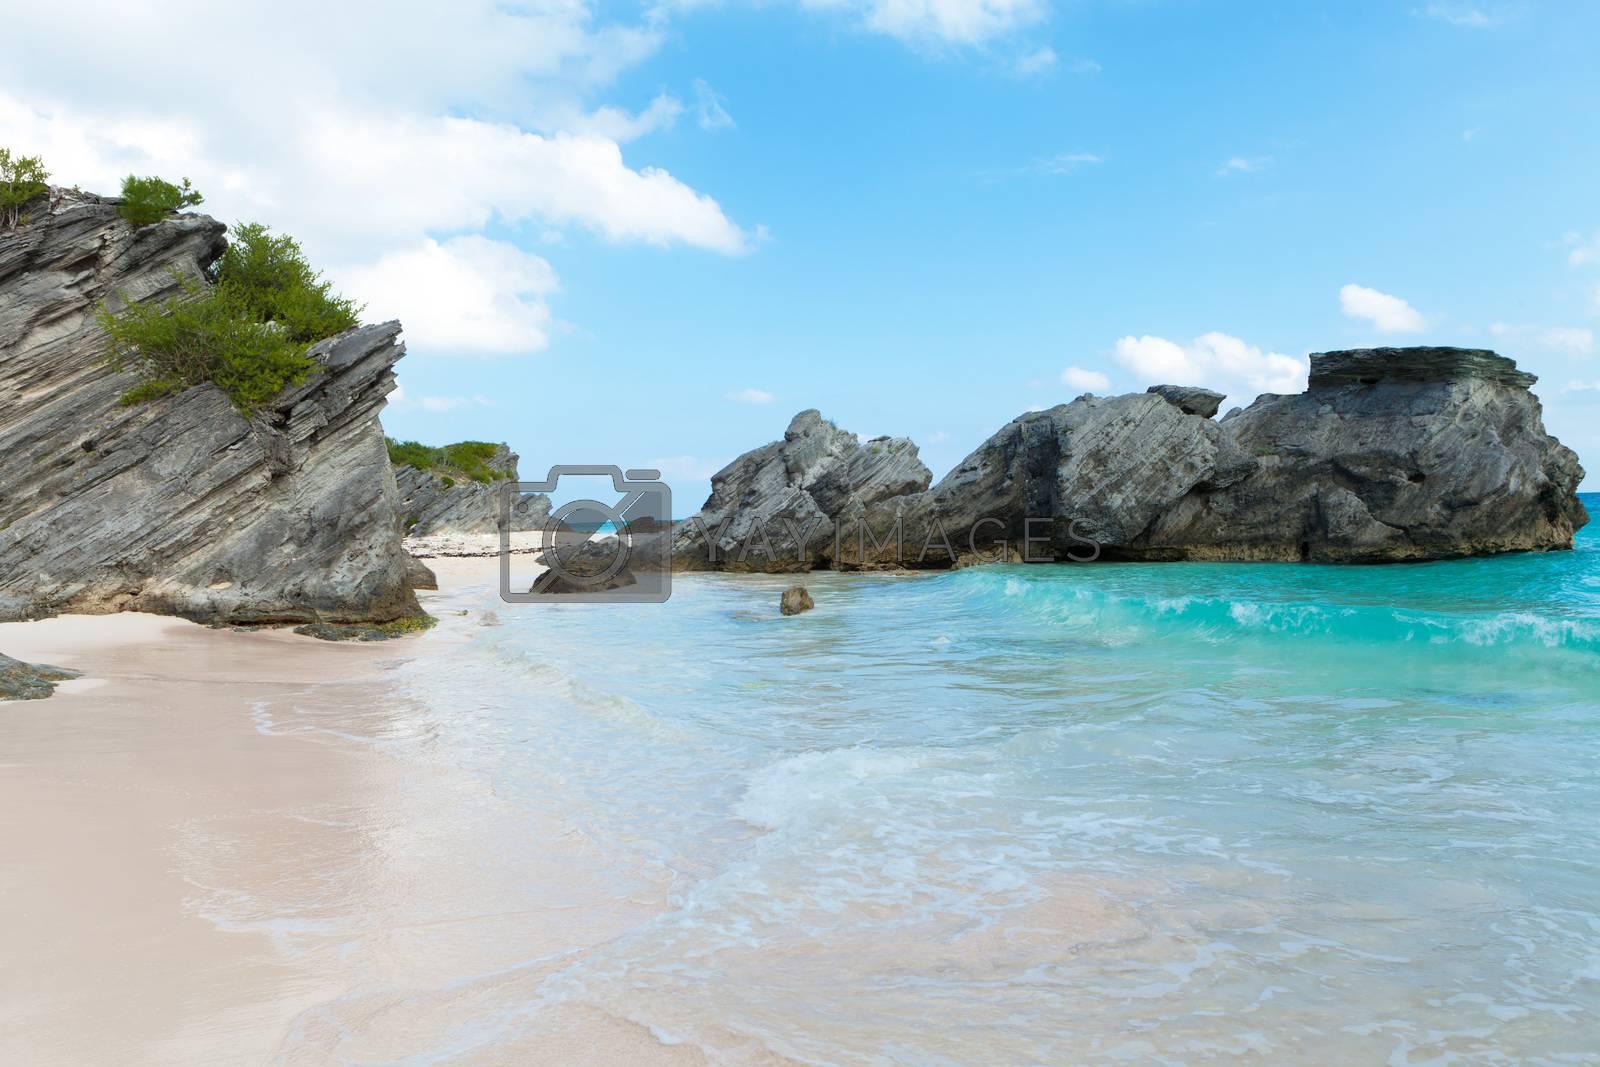 Bermuda Horseshoe Bay beach scene empty without any tourists.